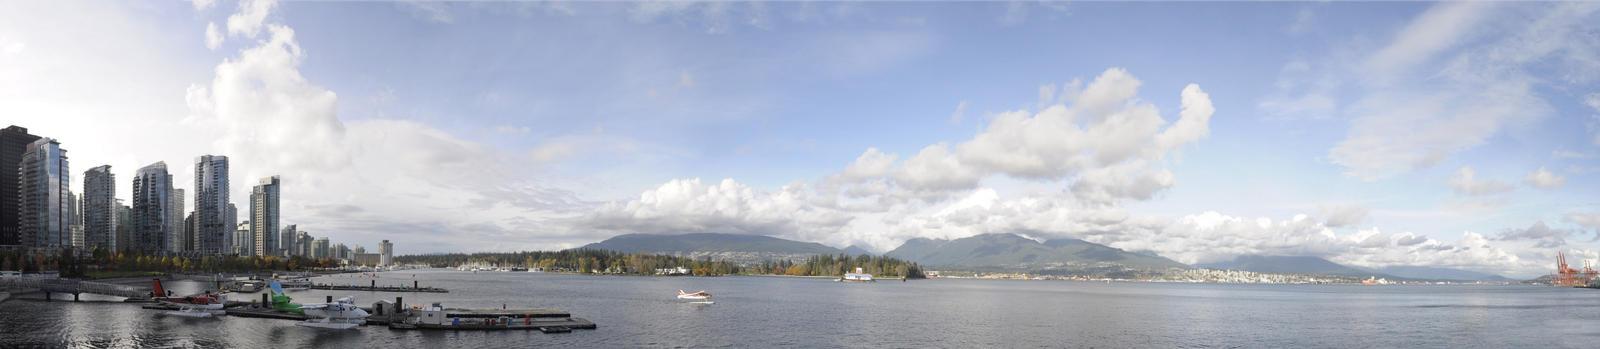 Panorama: Vancouver No1